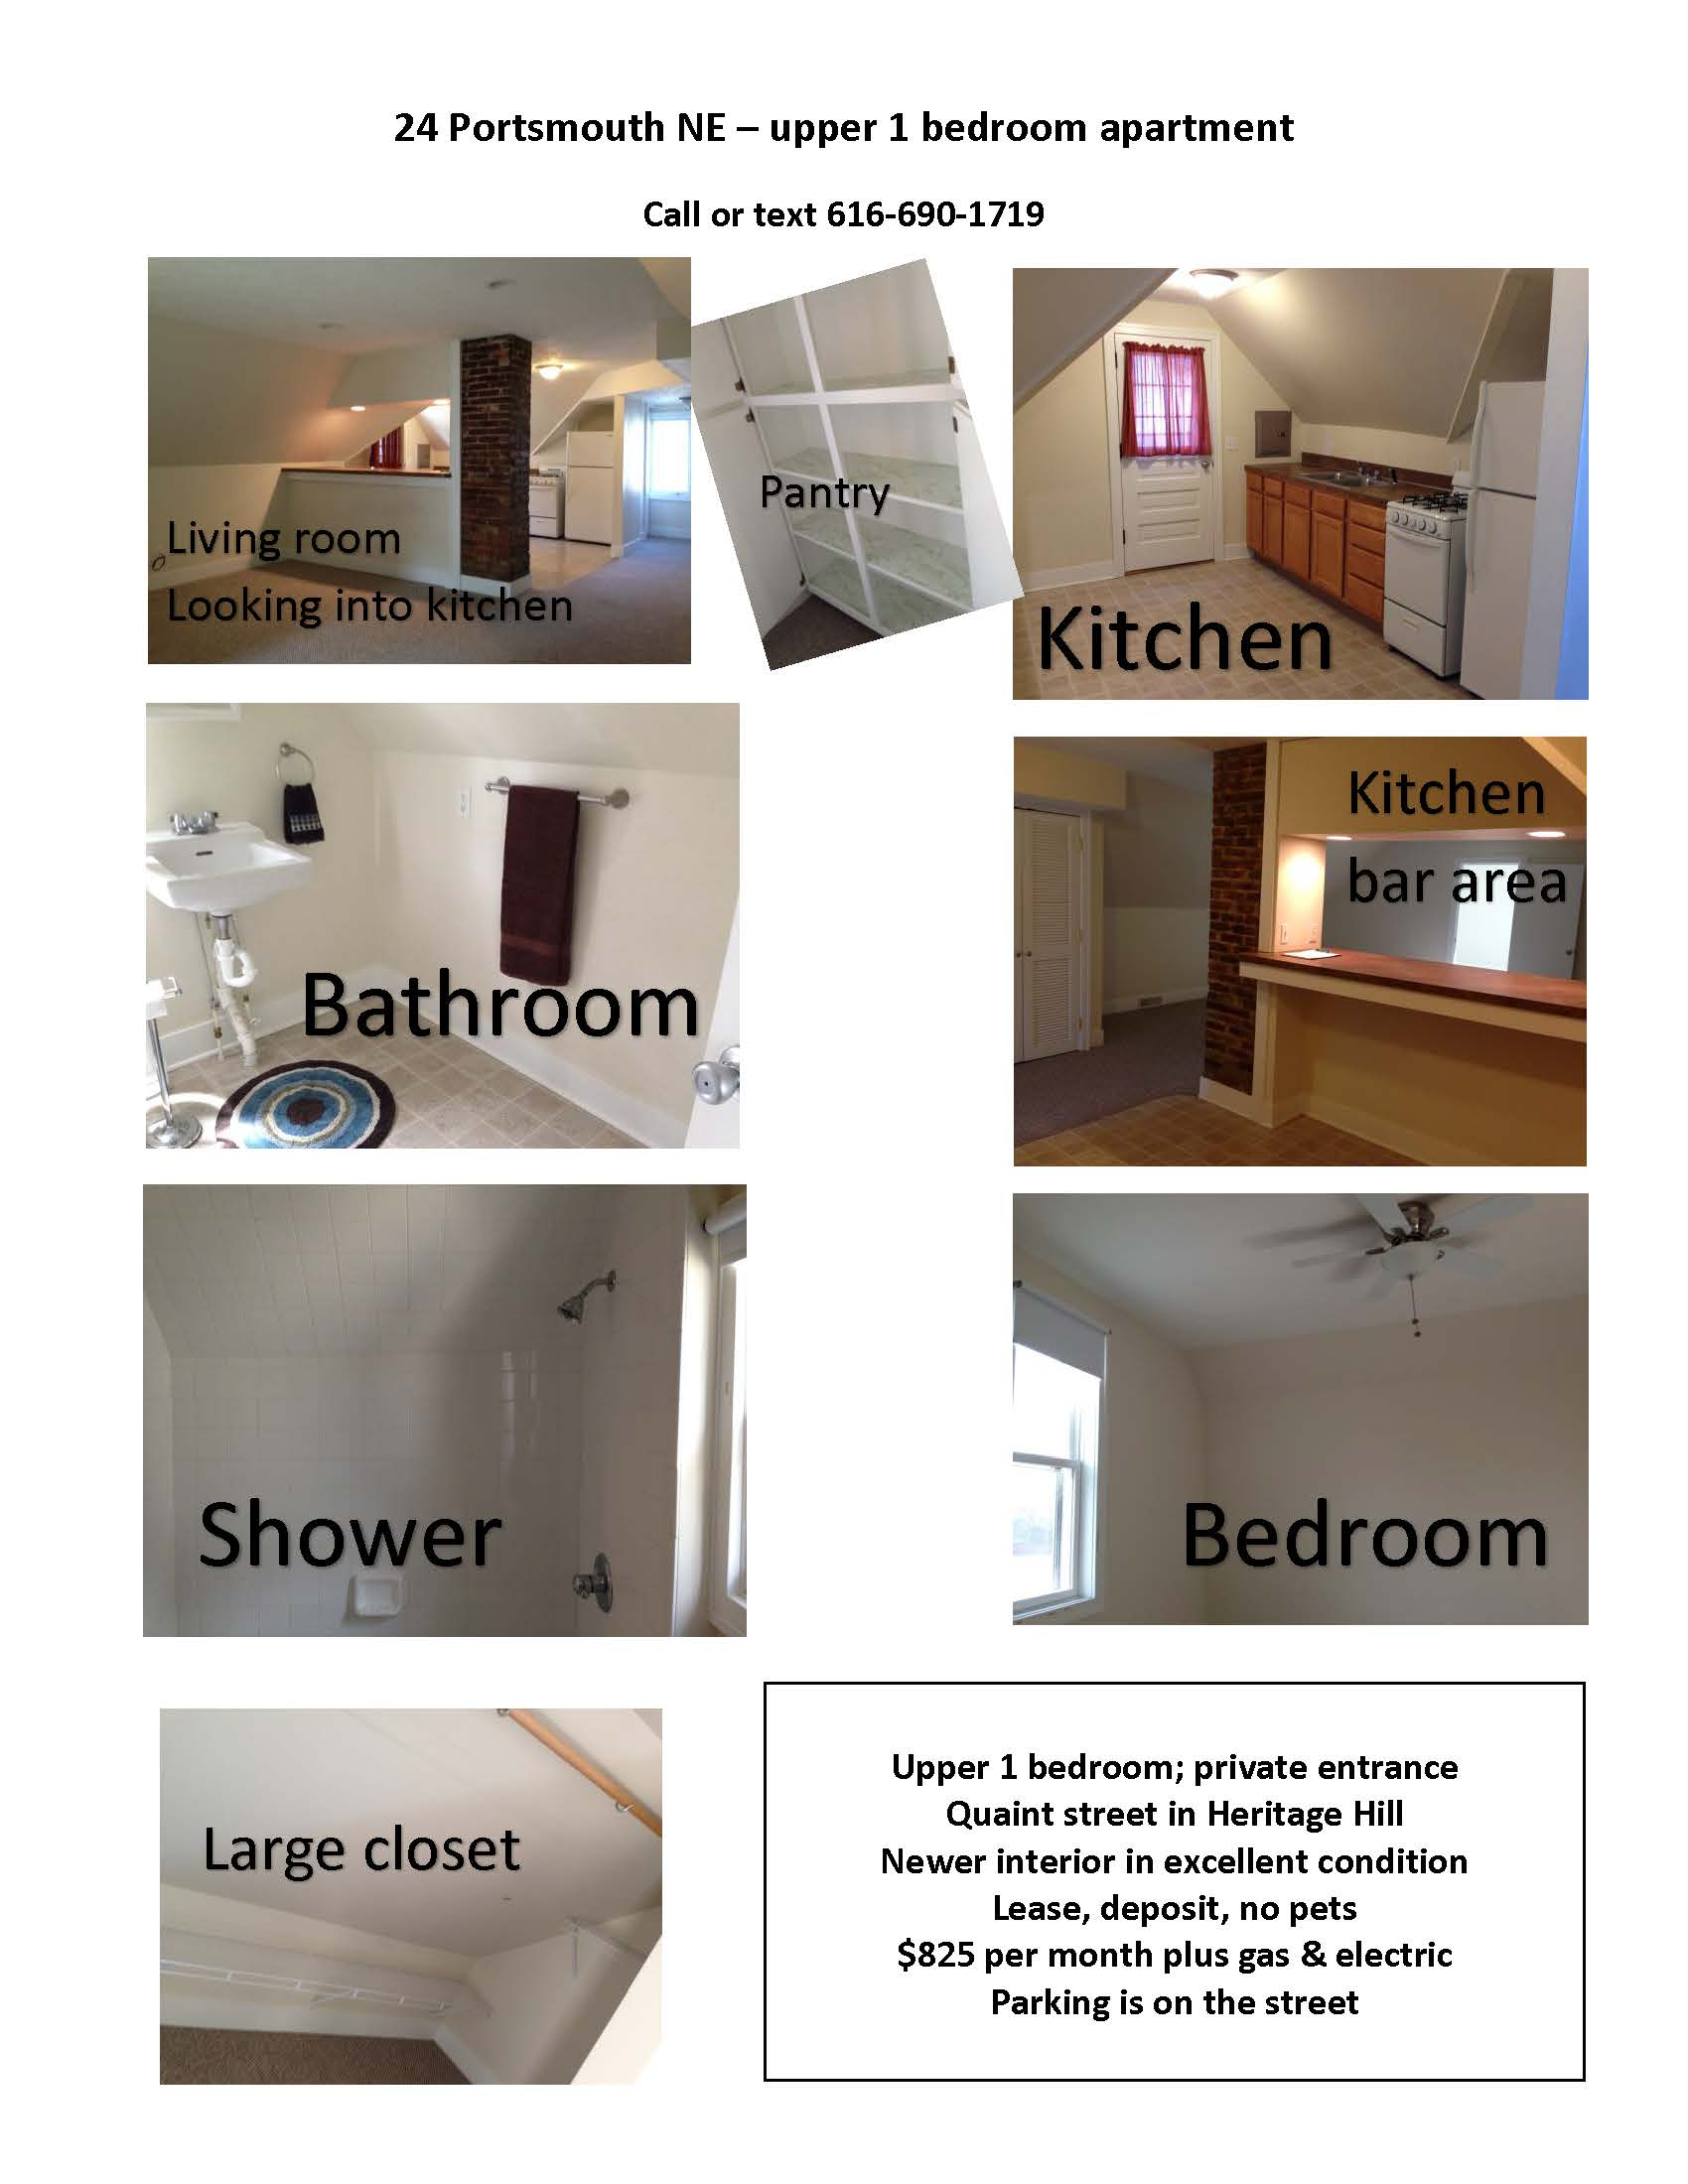 one bedroom apartments | heritage hill neighborhood association